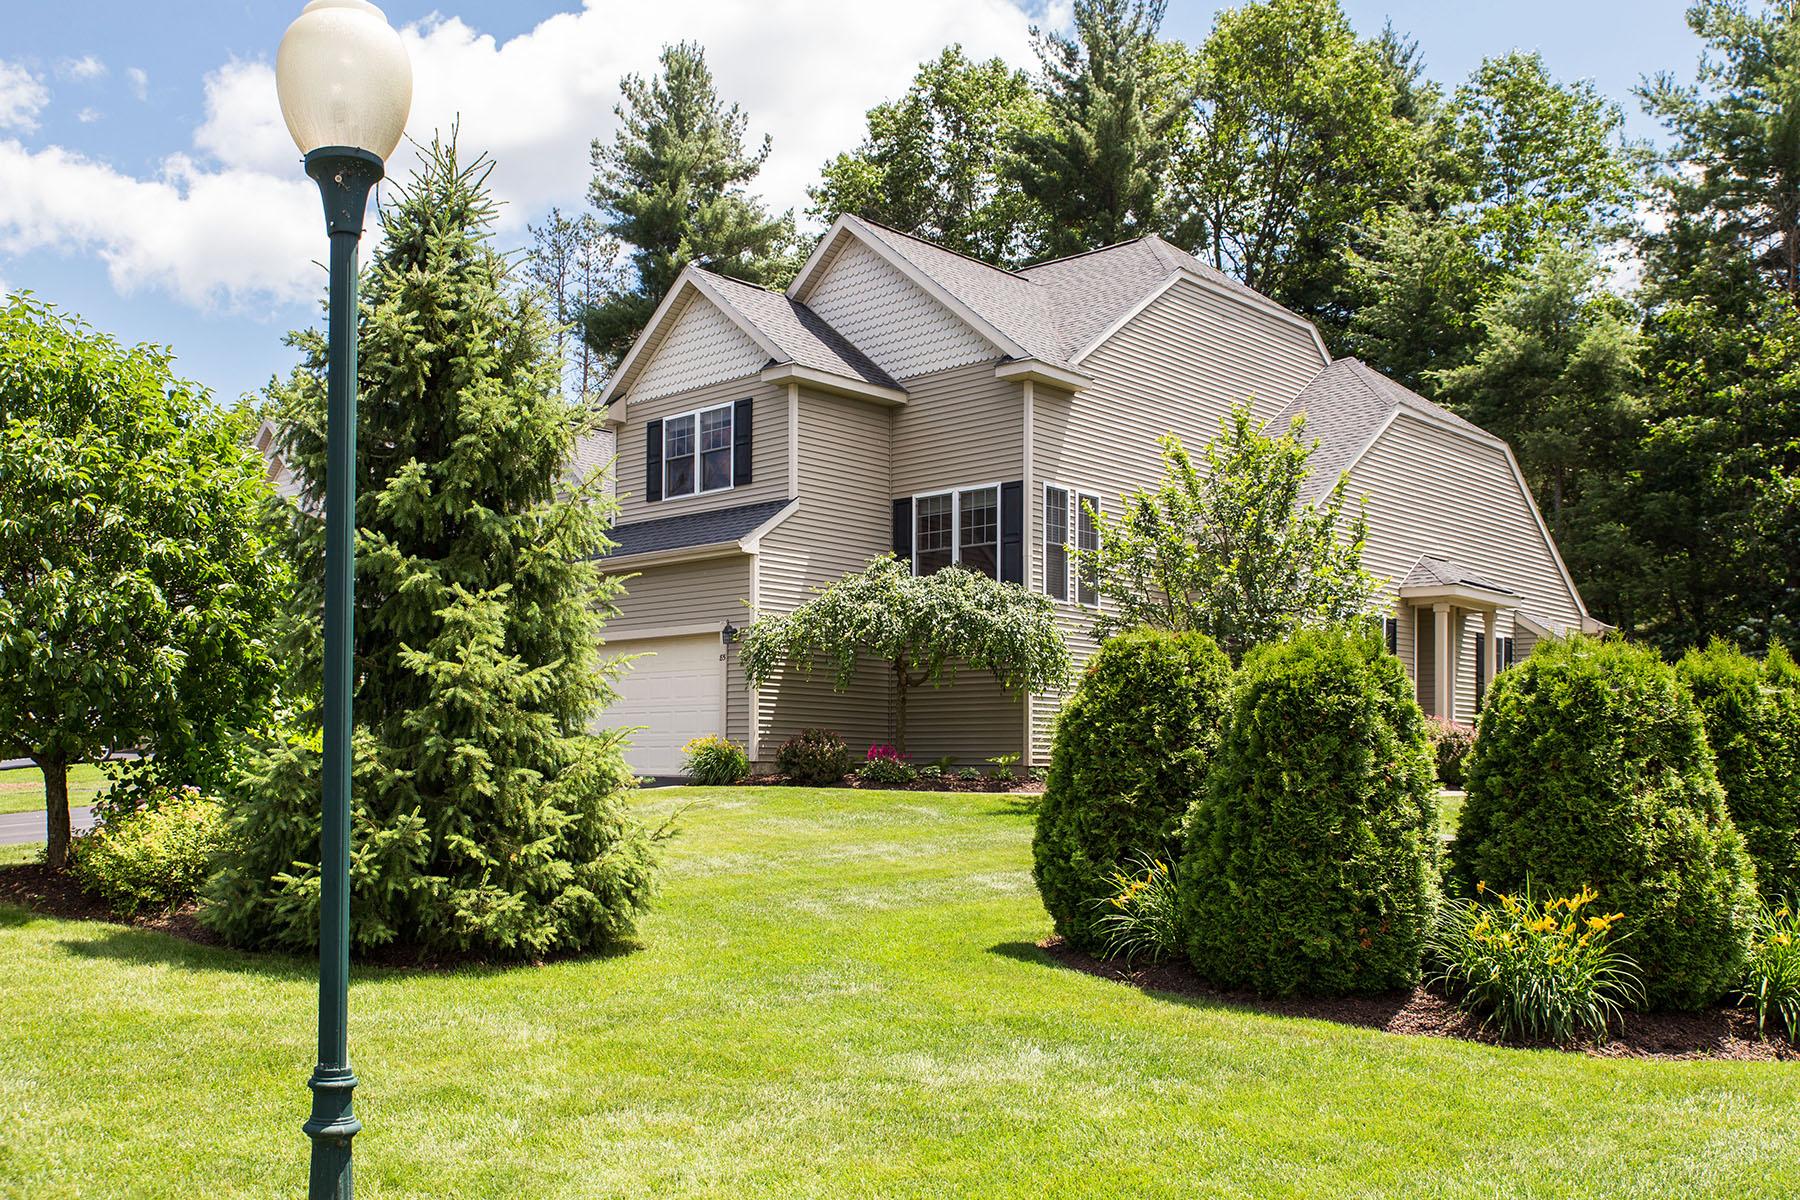 Nhà phố vì Bán tại Townhome on McGregor Golf Course 85 Claire Pass Saratoga Springs, New York 12866 Hoa Kỳ